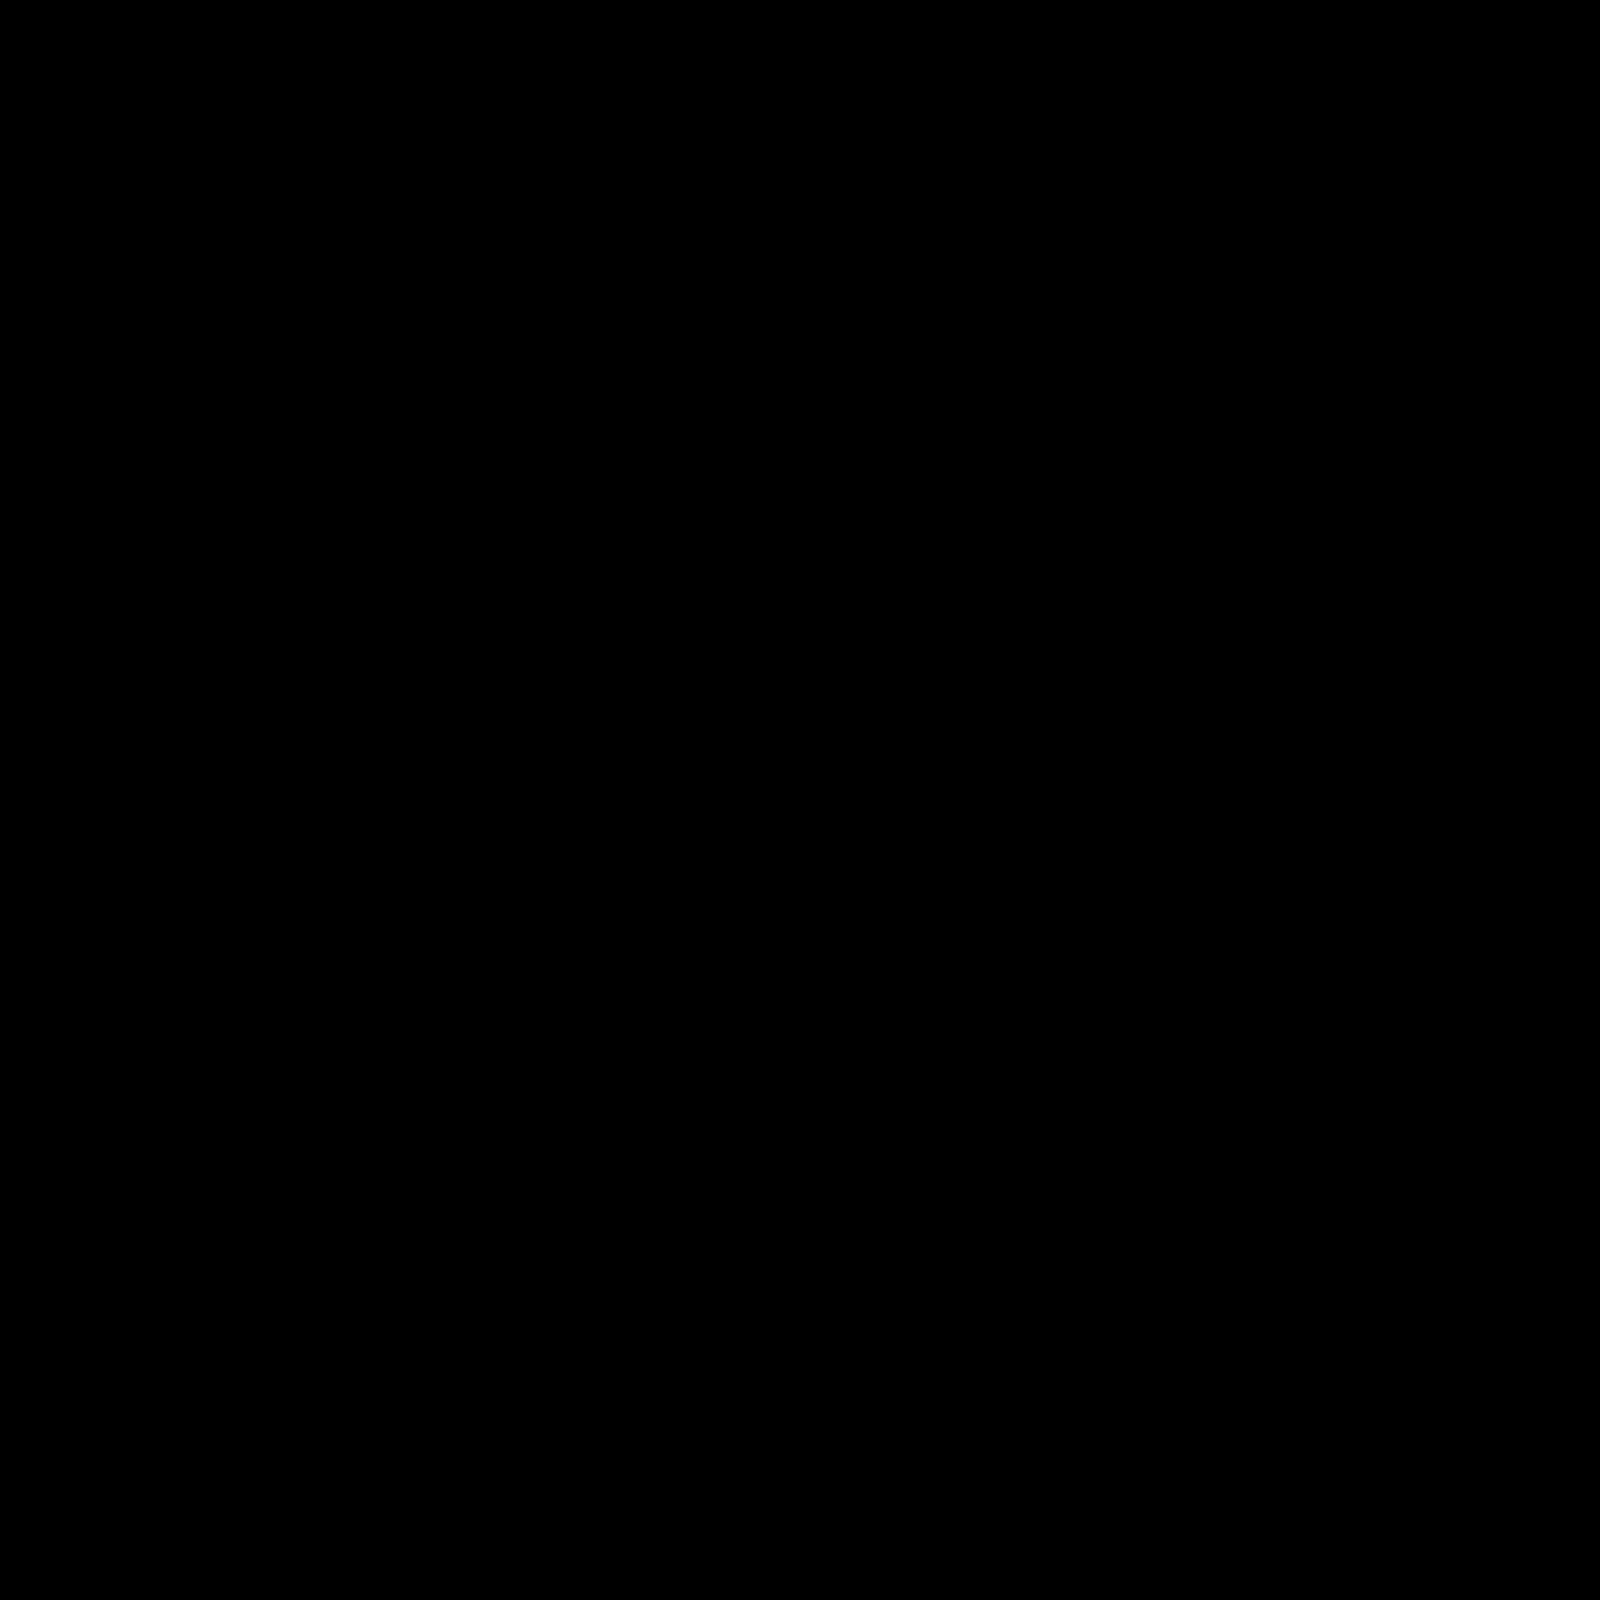 Flagpole Filled icon